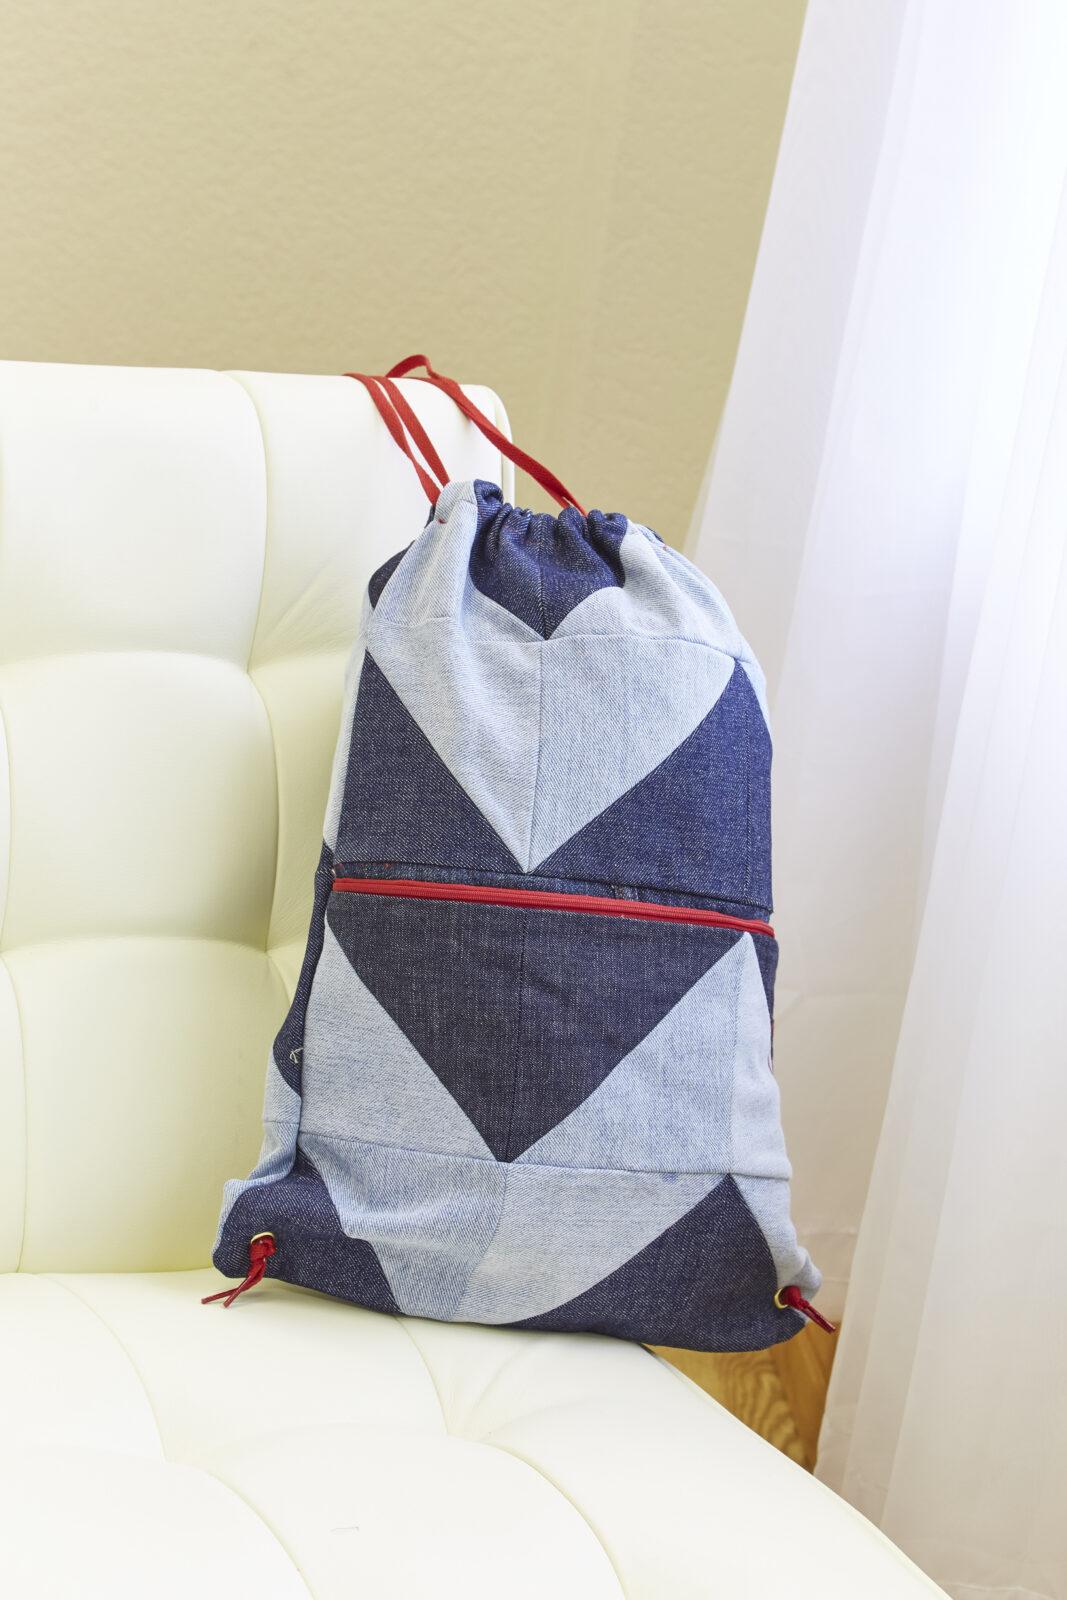 upcycled denim drawstring bag